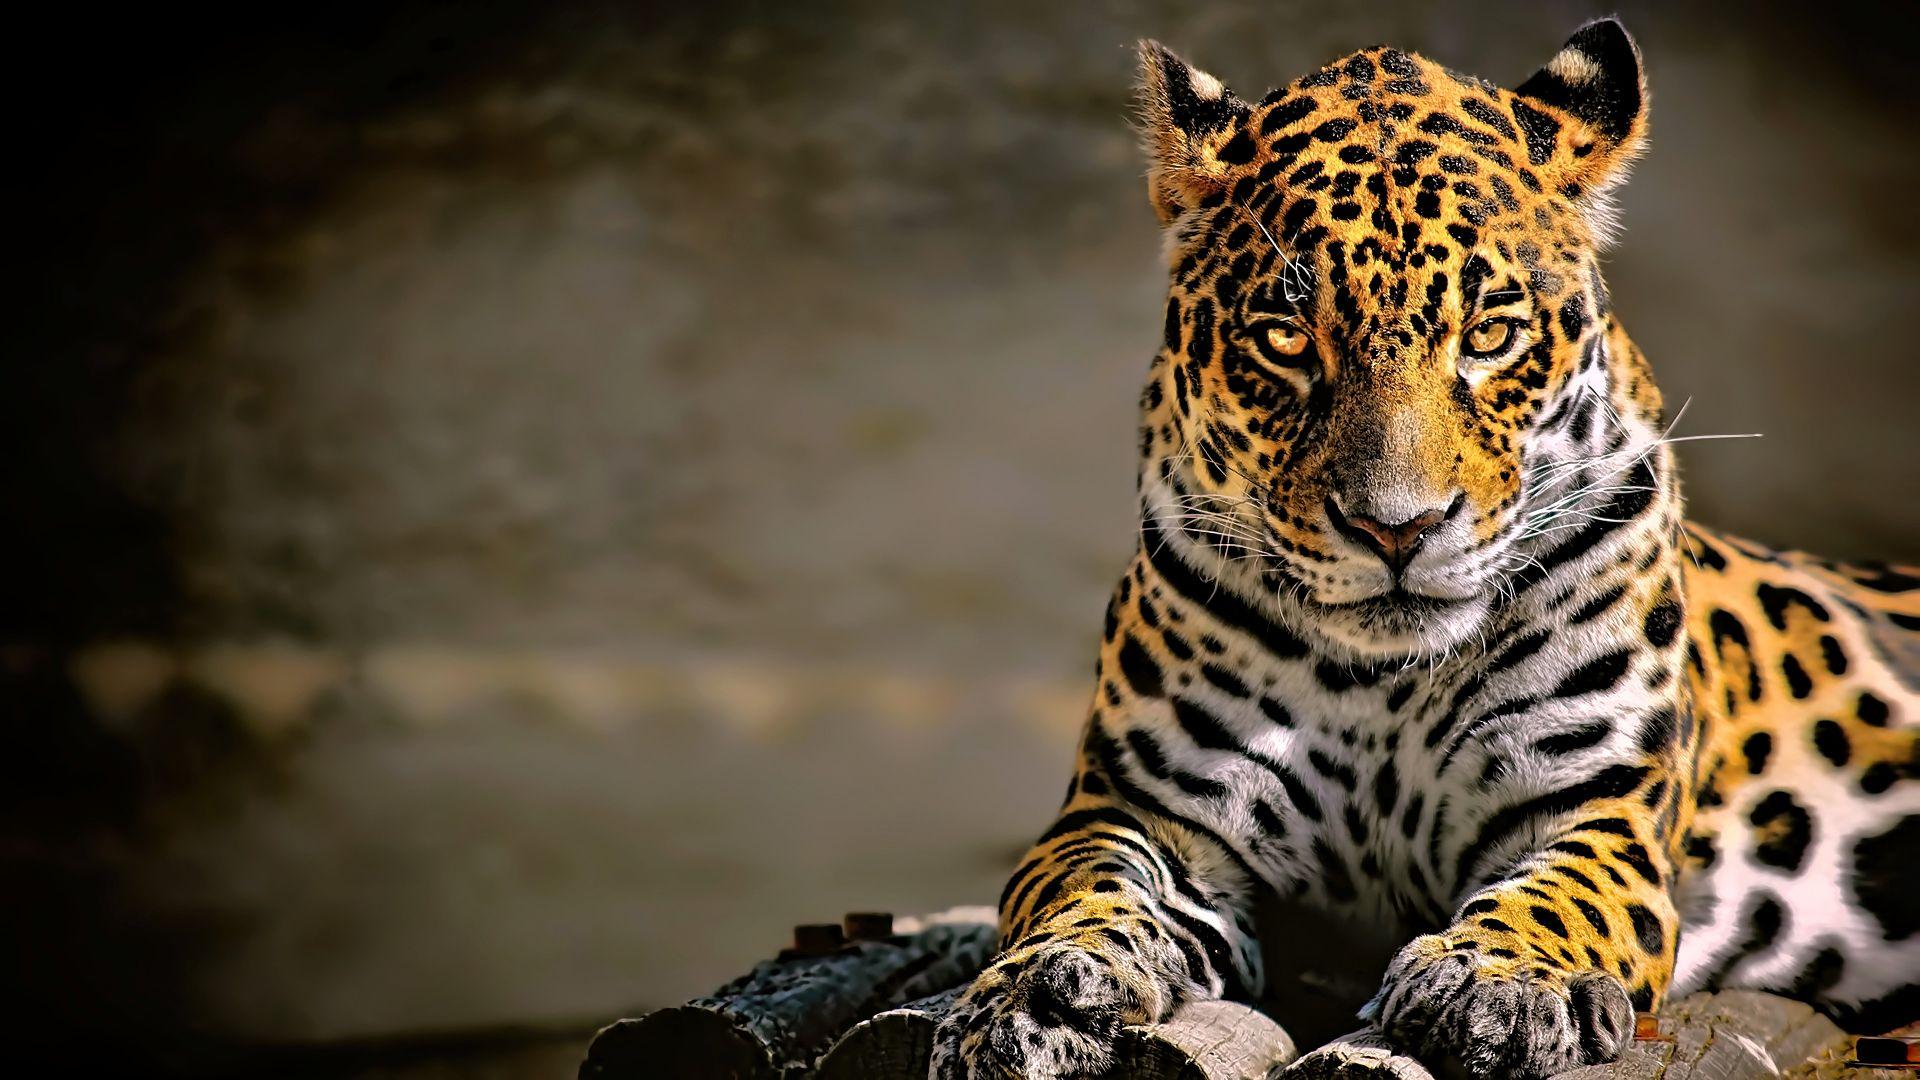 Wallpaper Confident, predator, leopard, animal, 4k